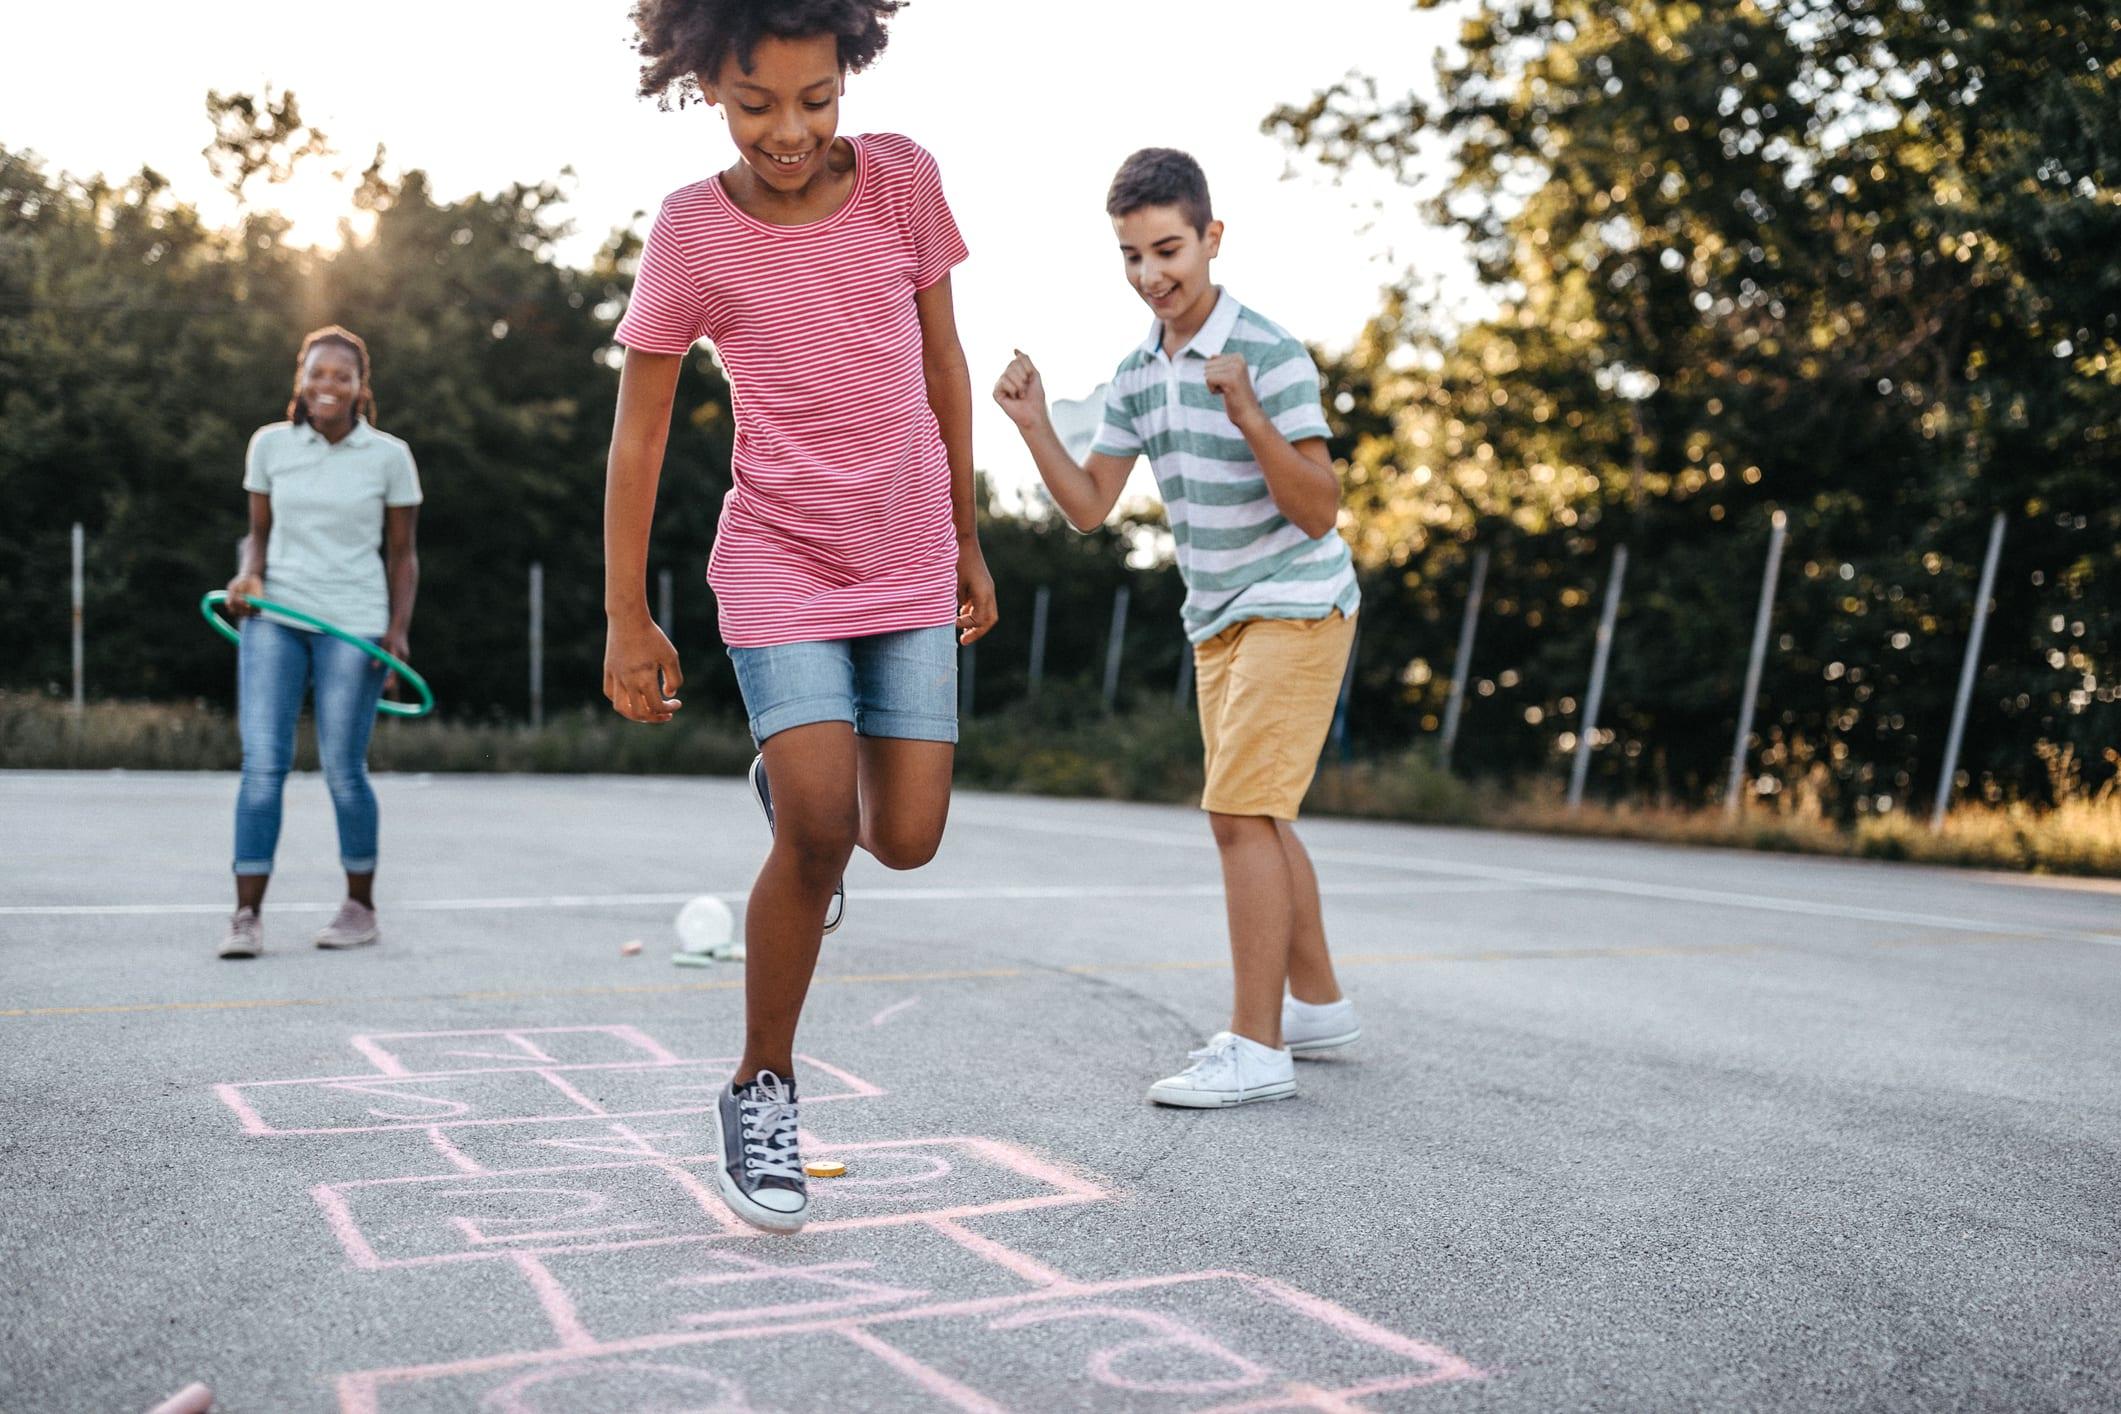 Doing what kids do best, jumping for joy